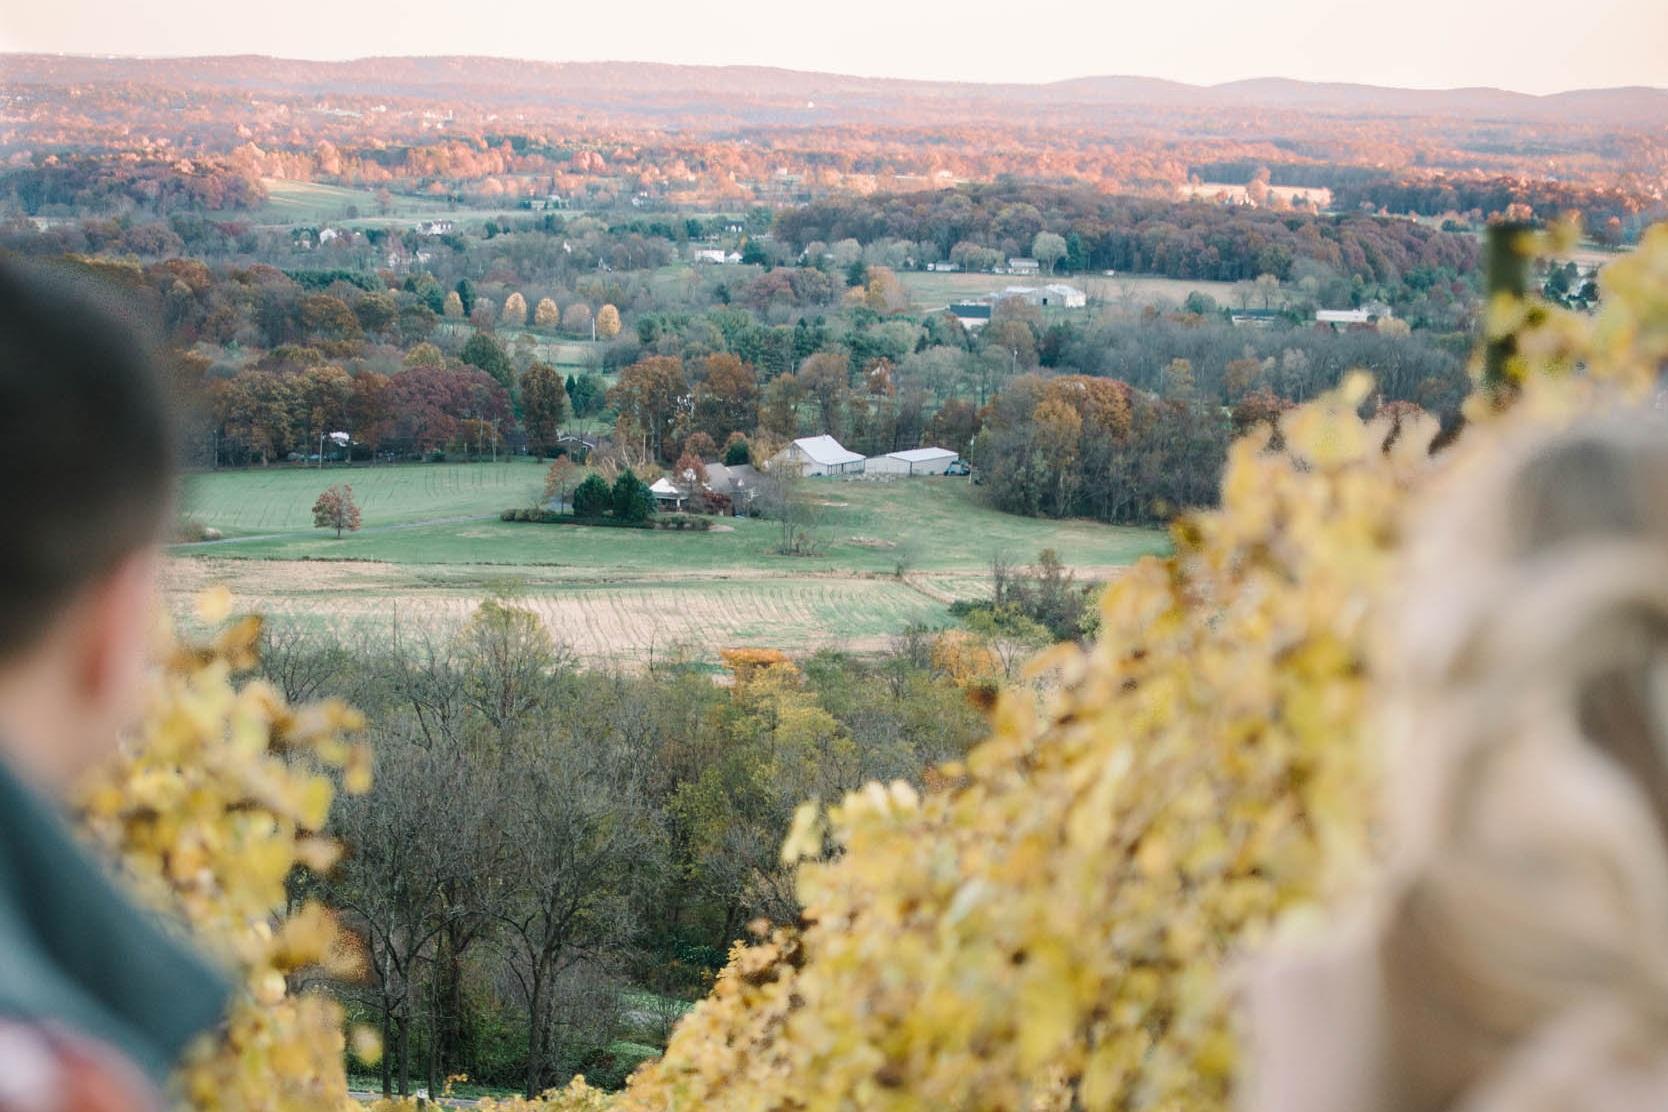 _new-bluemont-vineyard-in-the-vines-140.jpg